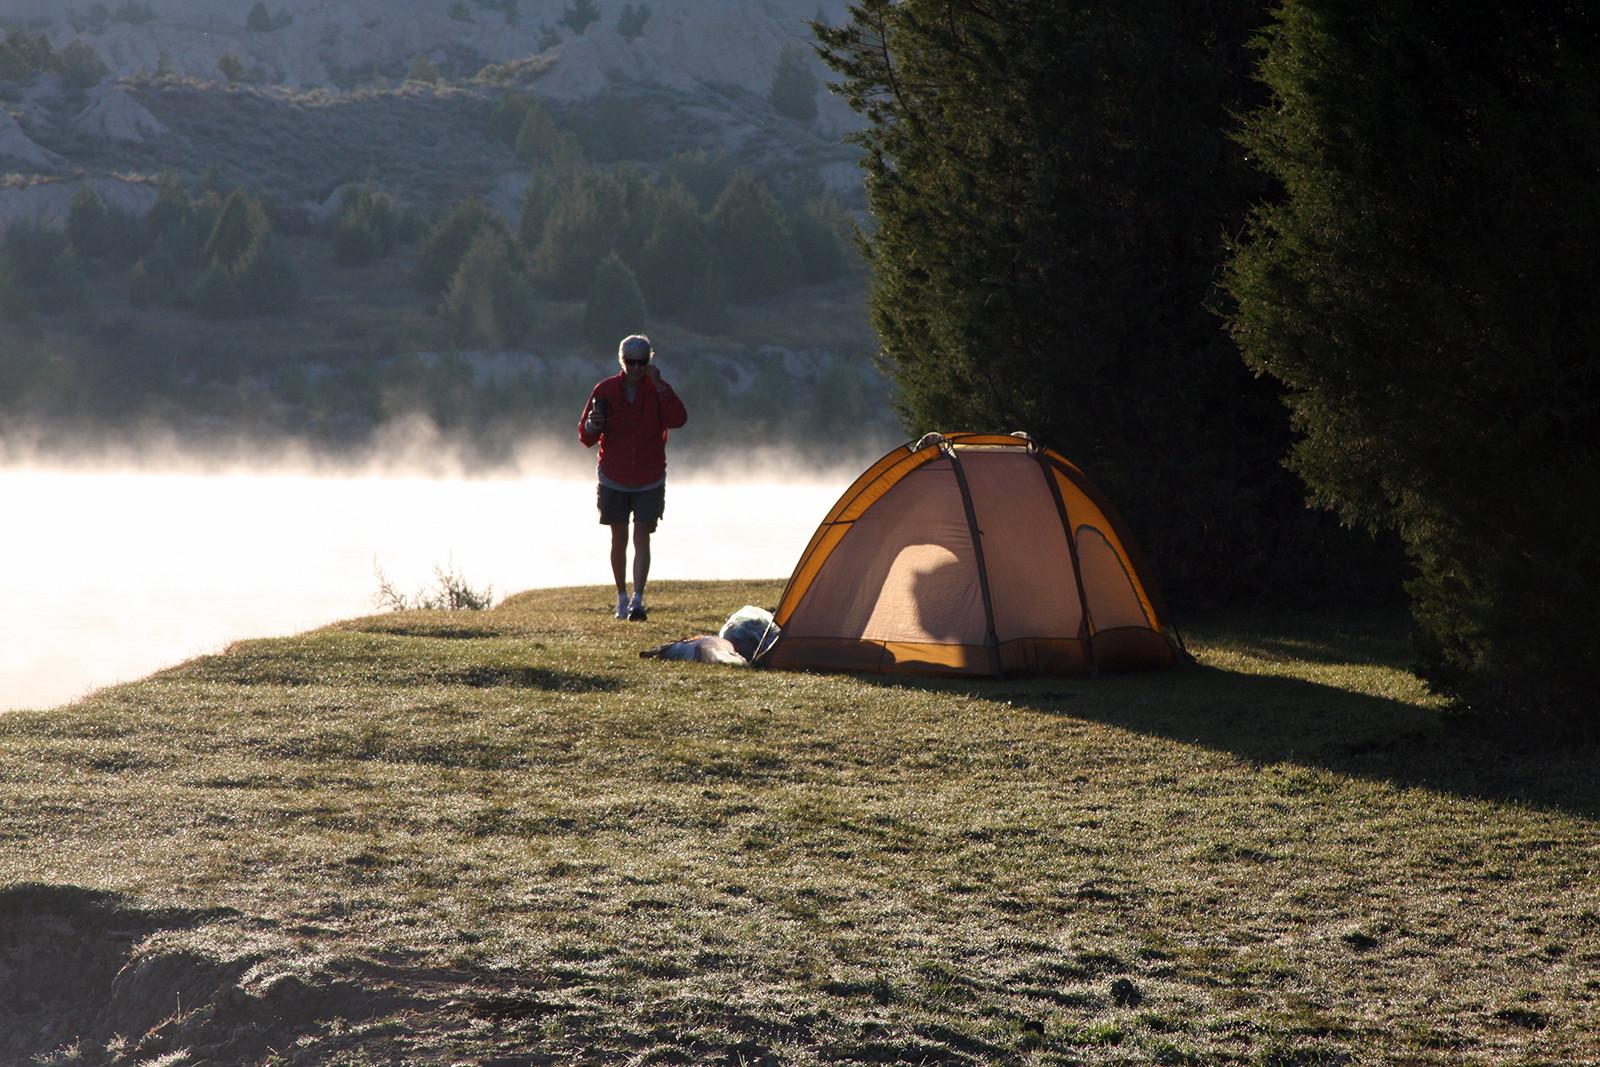 Wapiti Waters Fly Fishing Montana With Jack C. Mauer: Camping options